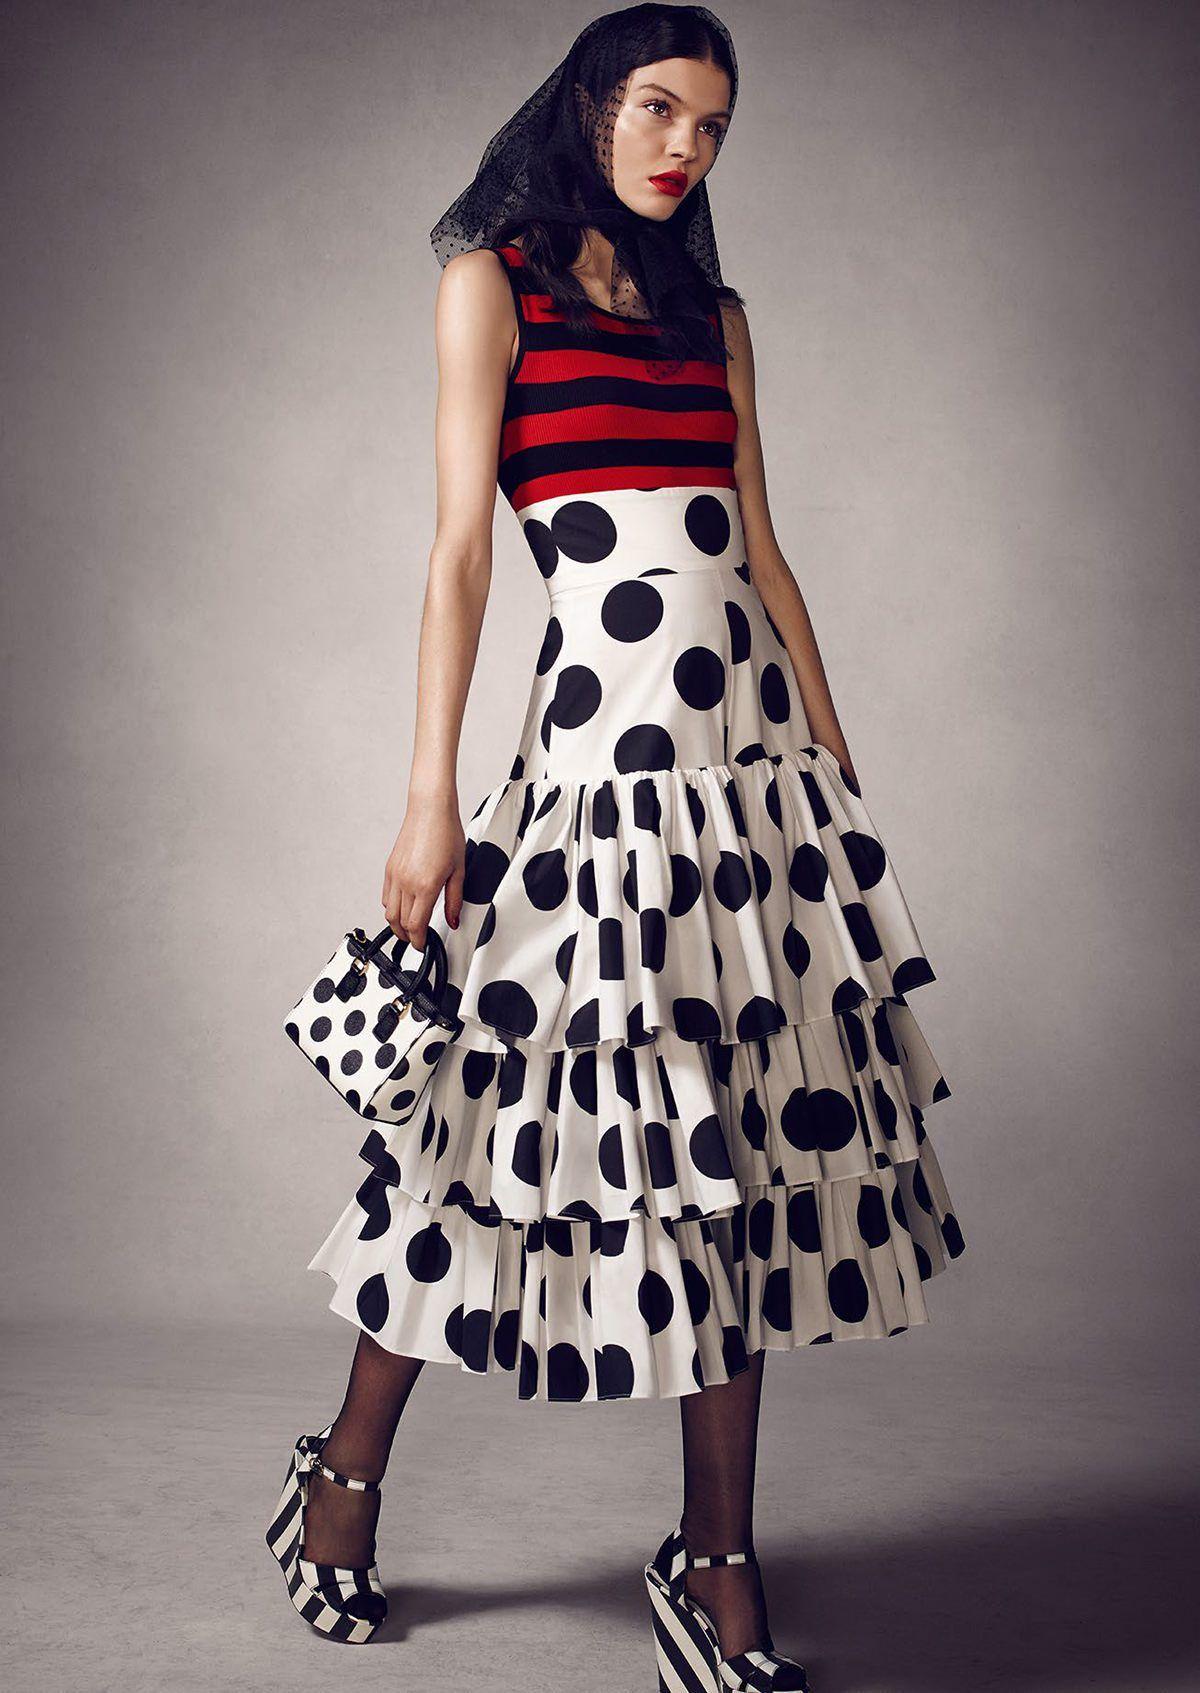 La Maestria Siciliana: Kate Bogucharskaia by Tony Kim for Vogue Mexico March 2015